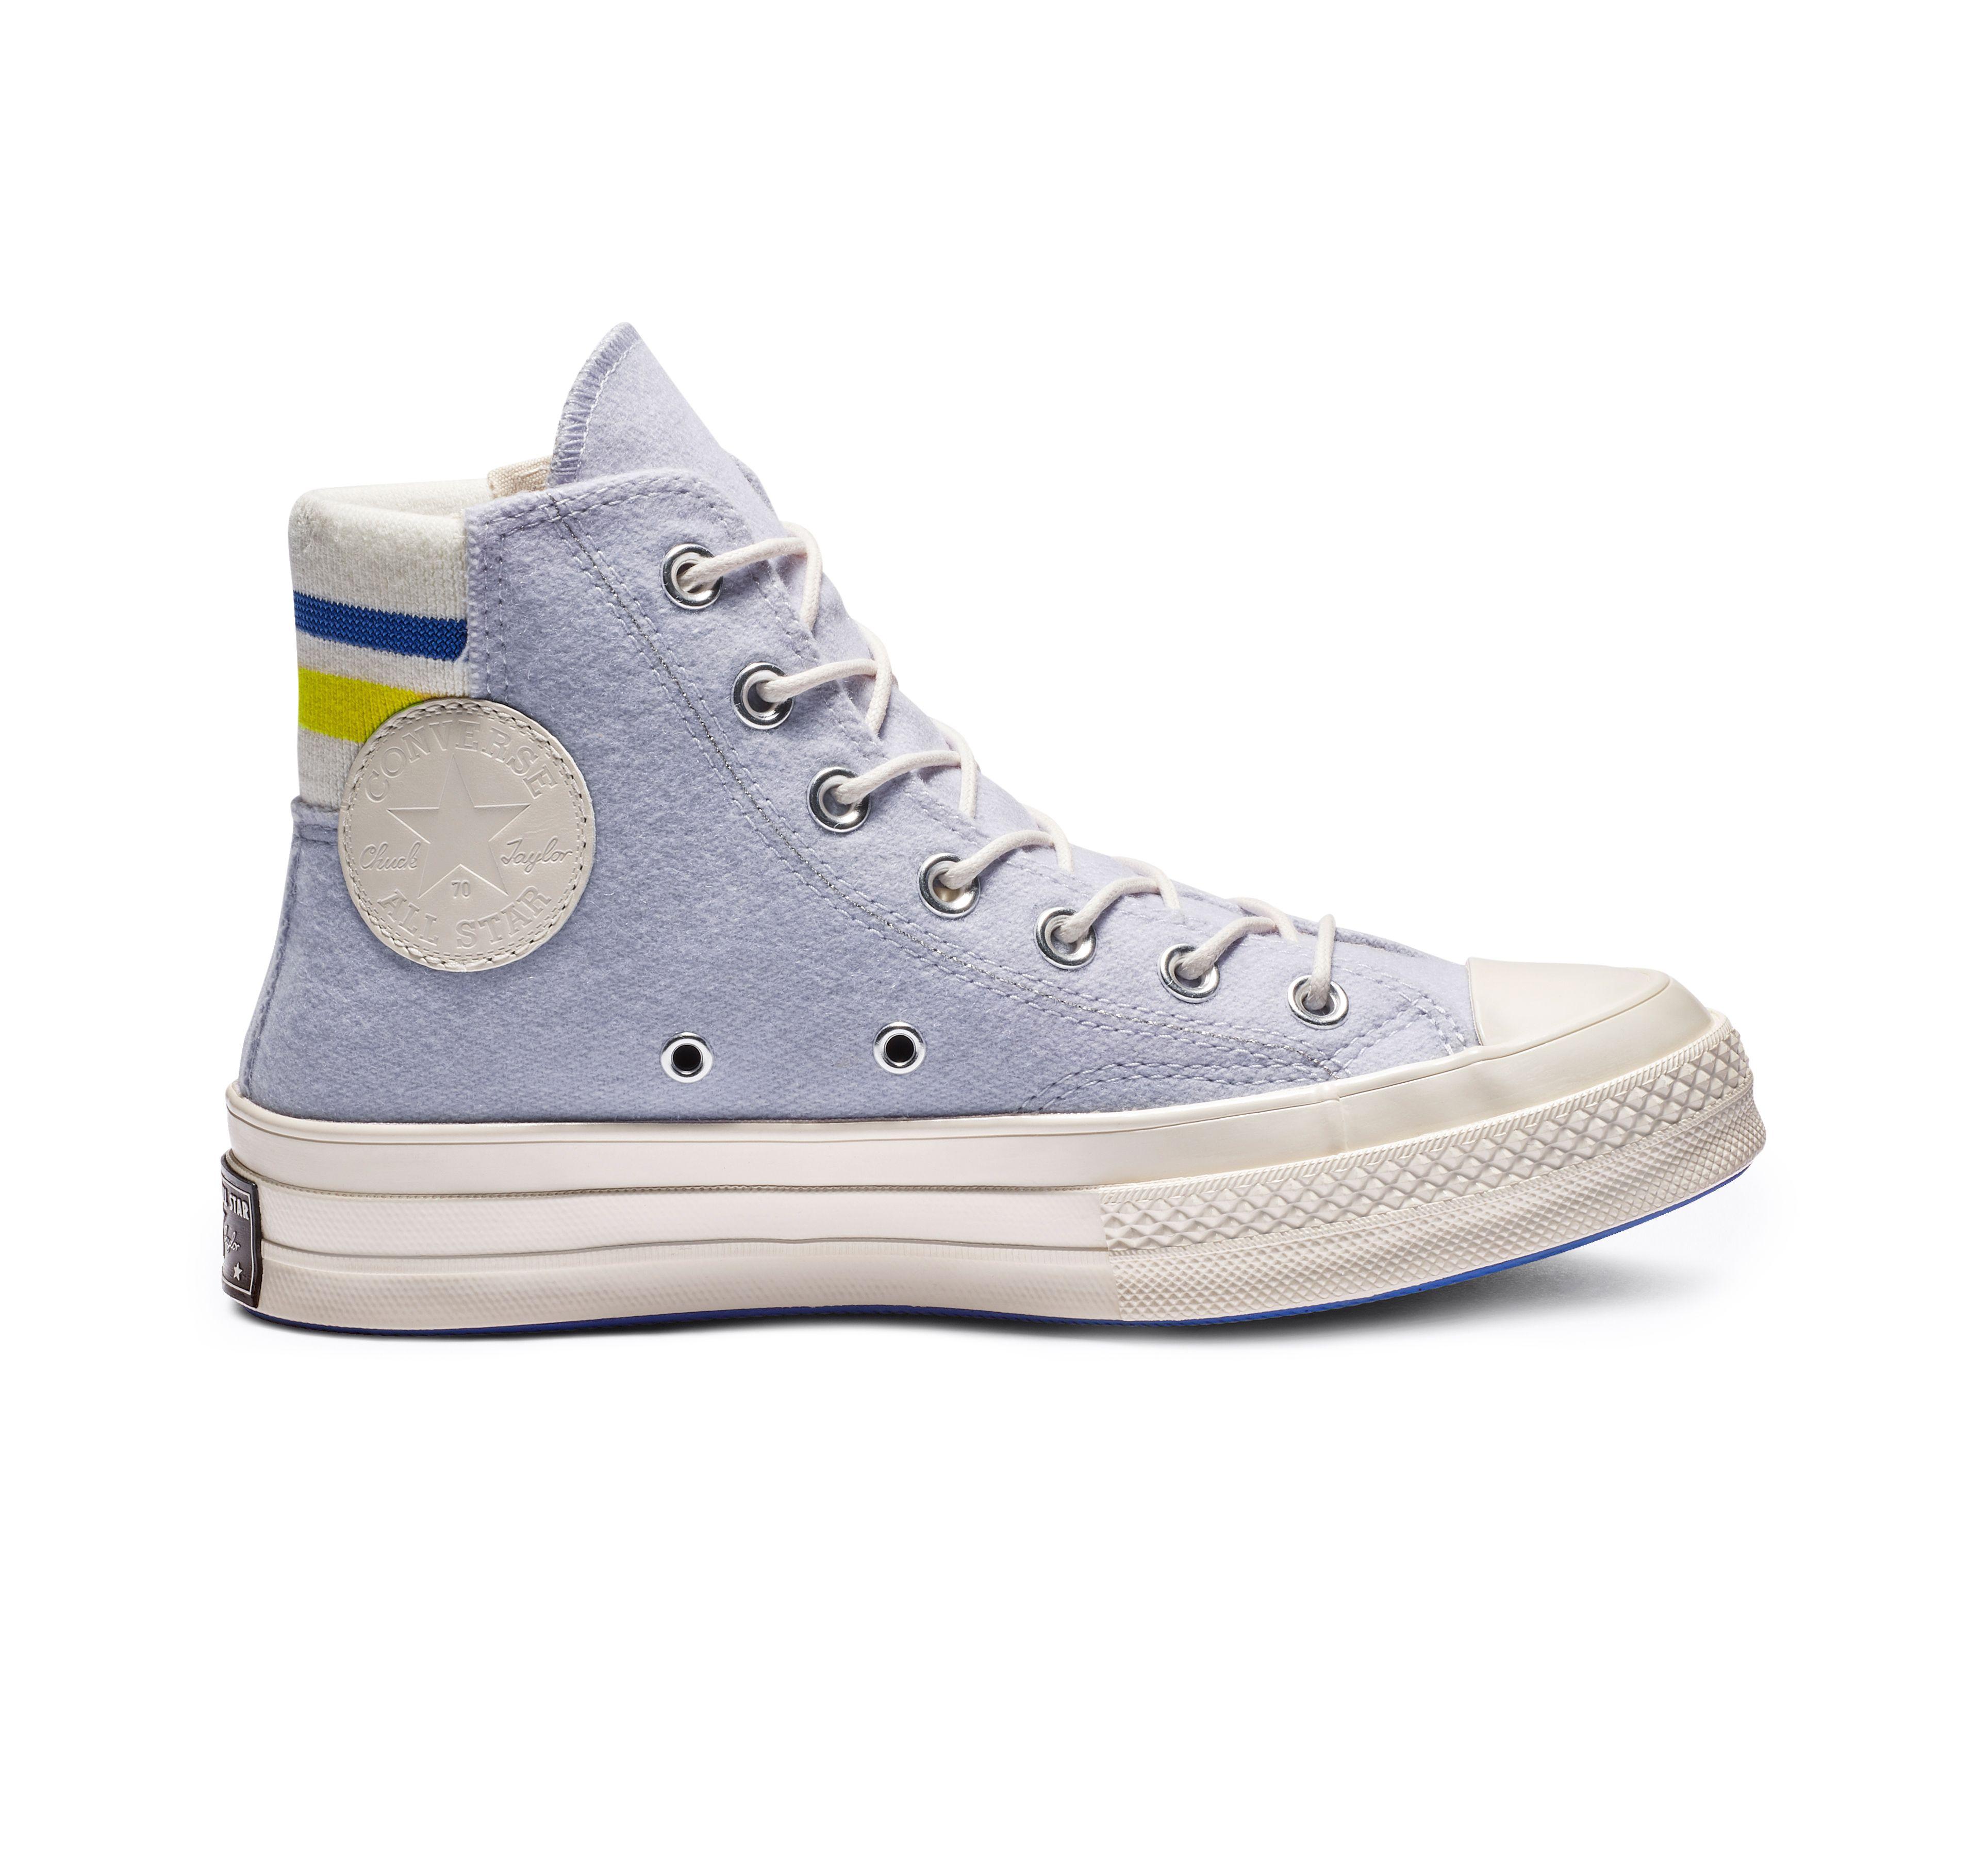 Chuck 70 Retro Stripe High Top | Black high top shoes